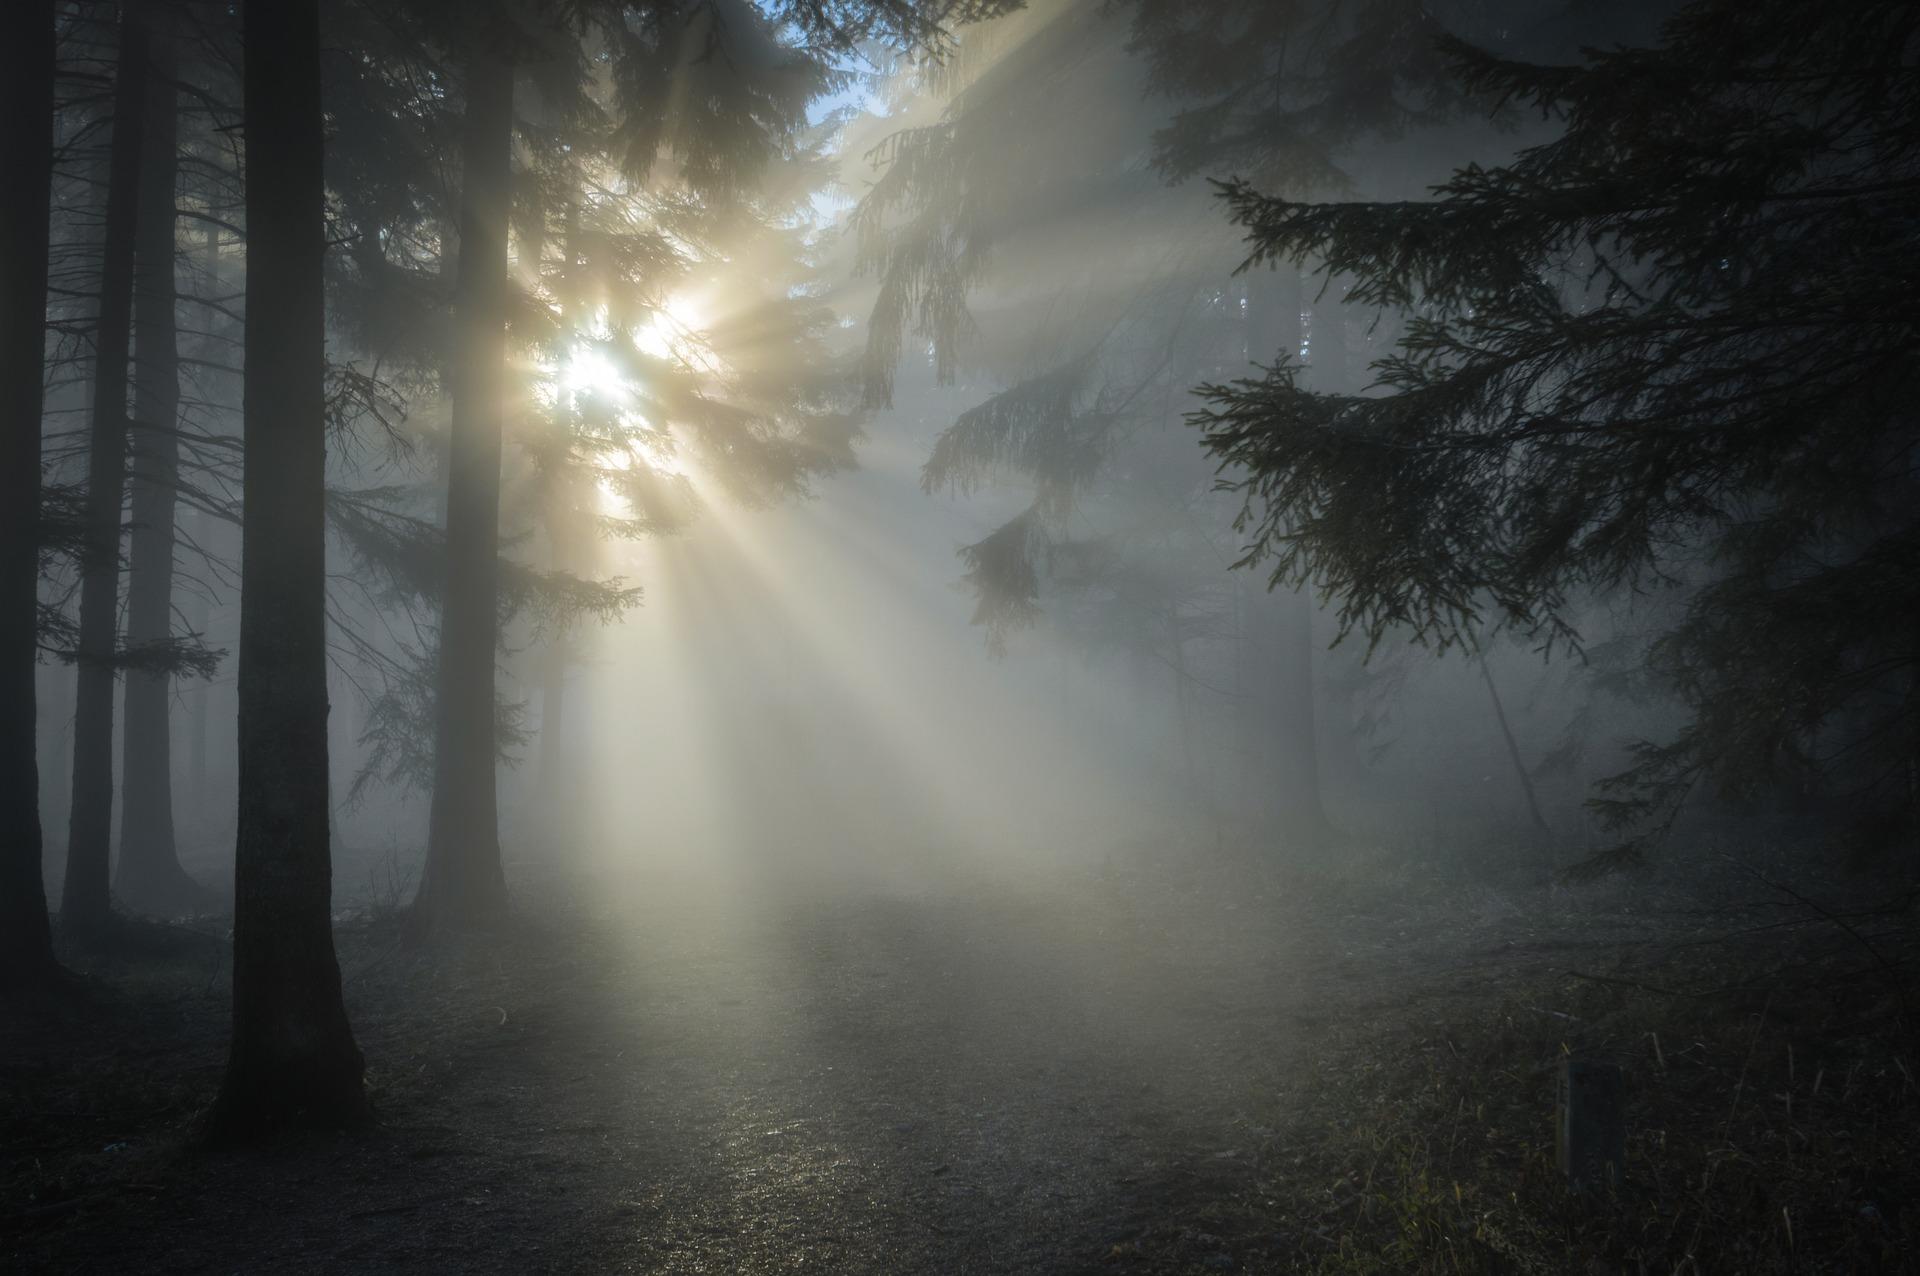 sun shine in a foggy forest